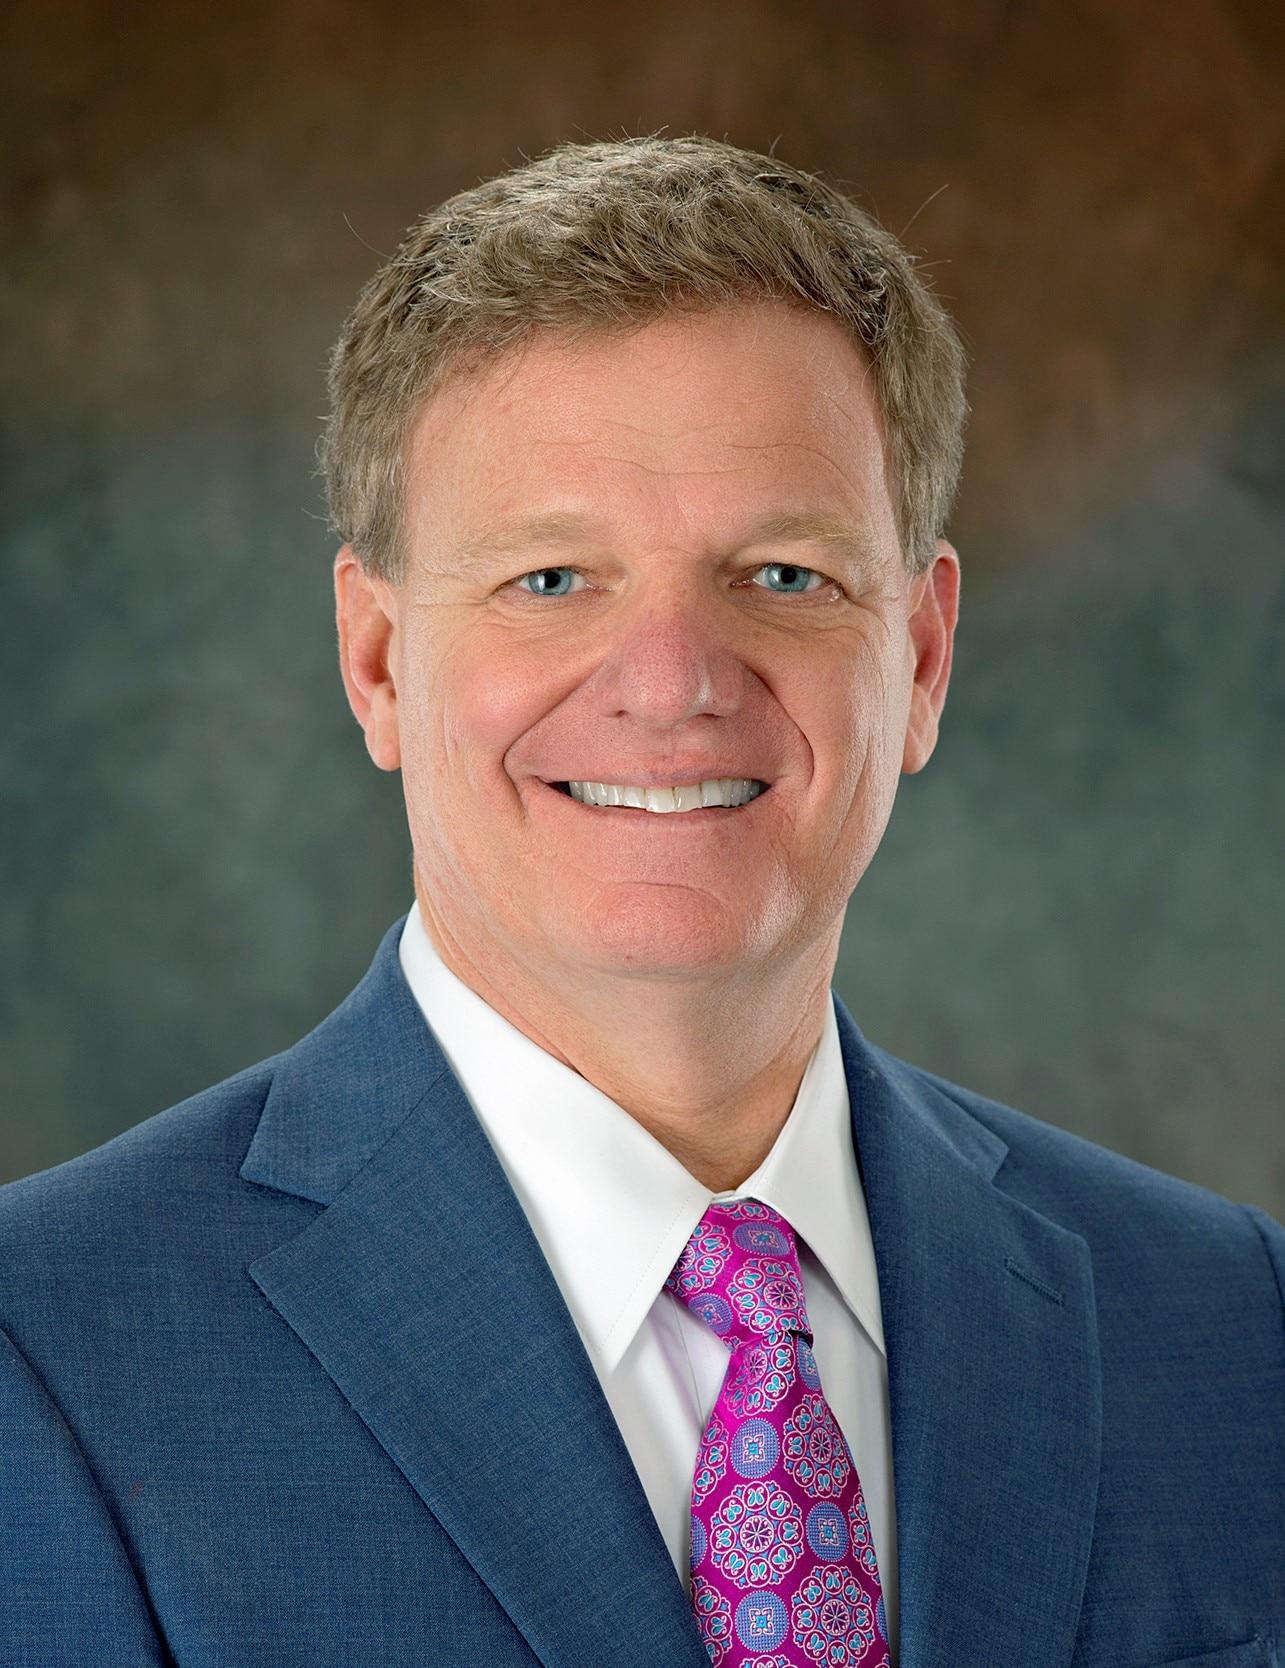 J WINSTON HOLLINGSWORTH  Your Financial Advisor